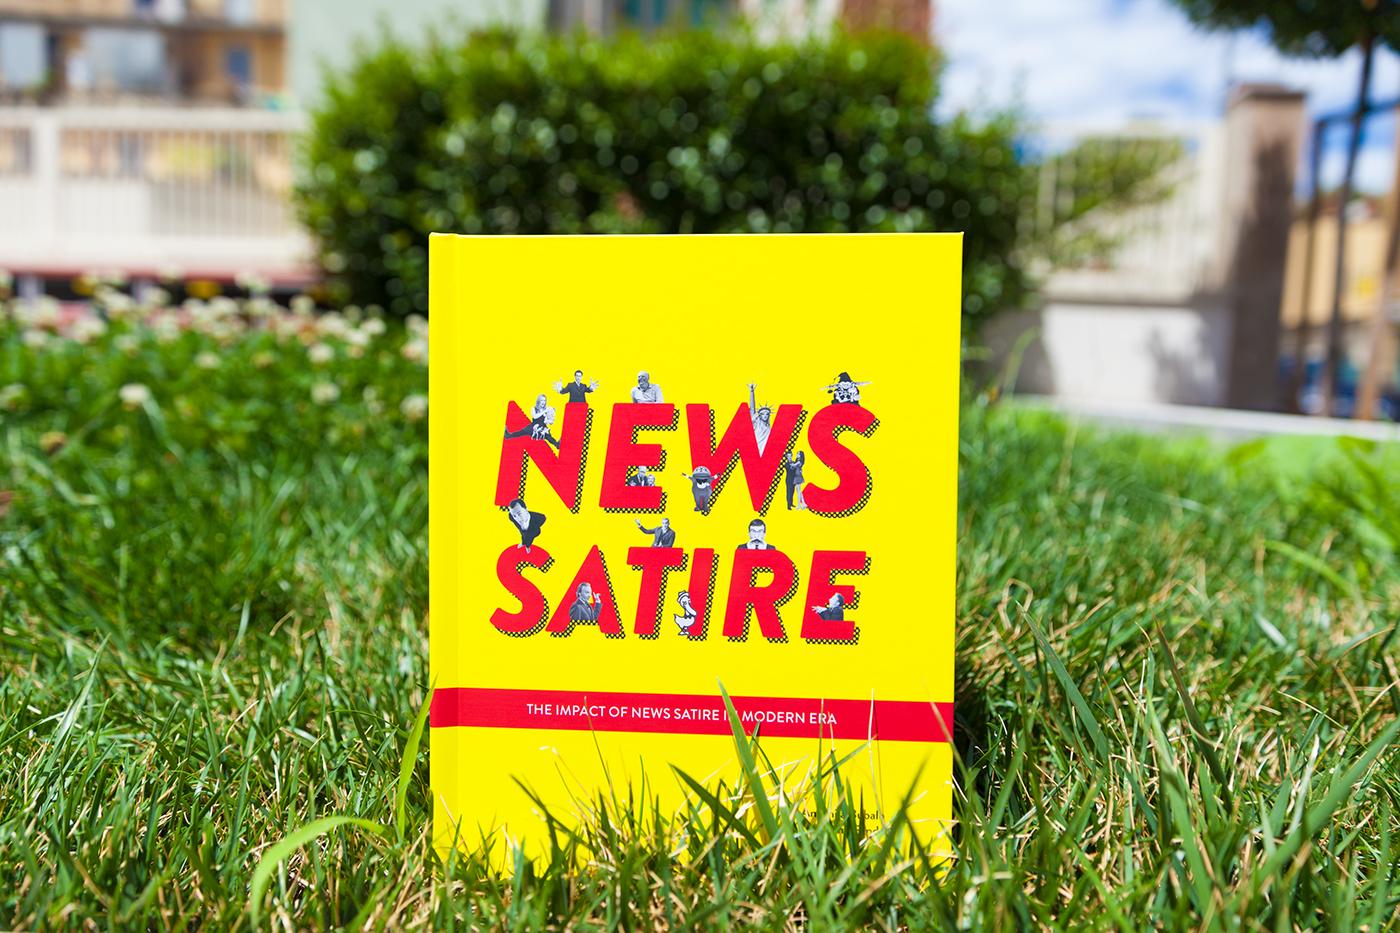 News Satire news satire Parody laugh television Web media printed charlie hebdo